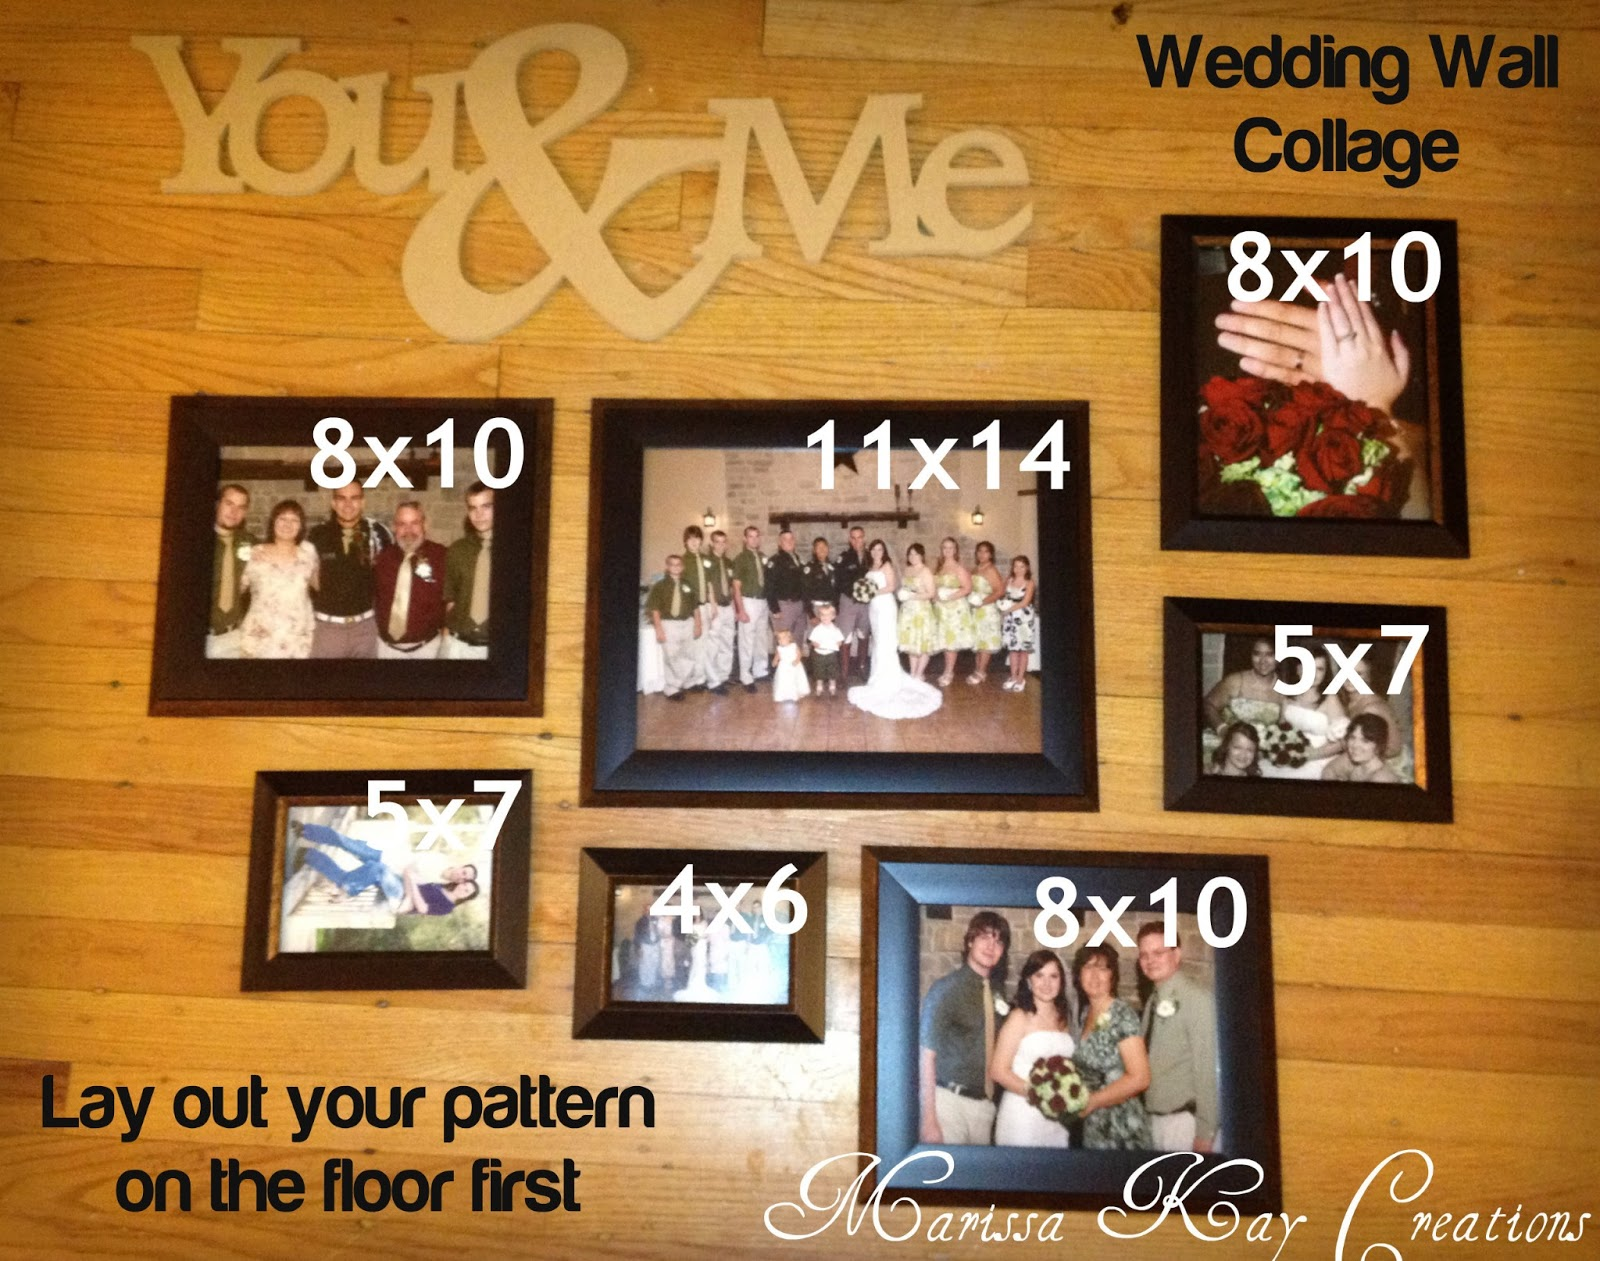 Wedding Wall Collage